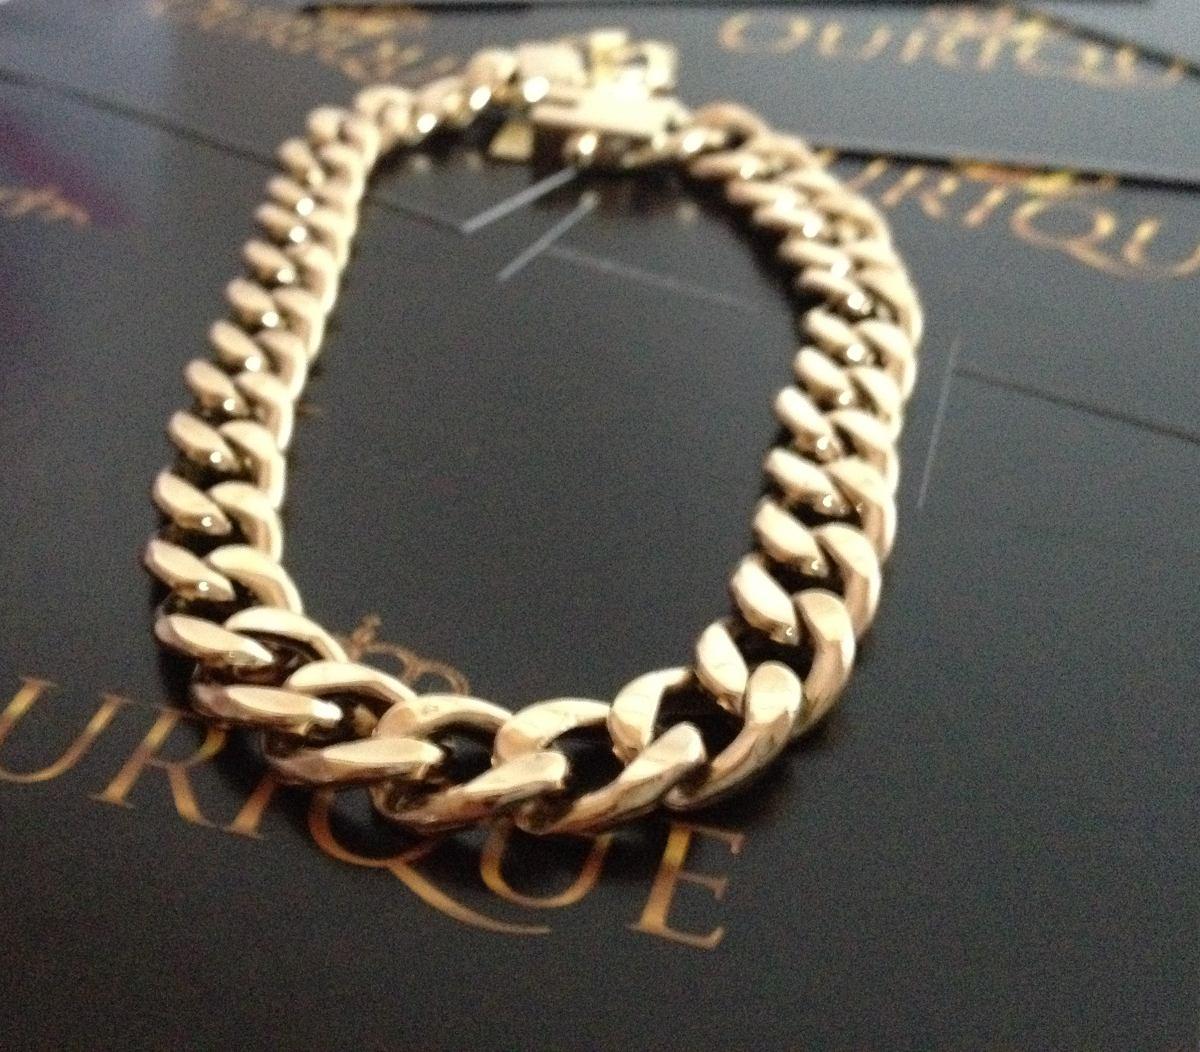 c5f5fc63633e9 pulseira masculina groumet elos 1x1 grumet de ouro 18k 750. Carregando zoom.